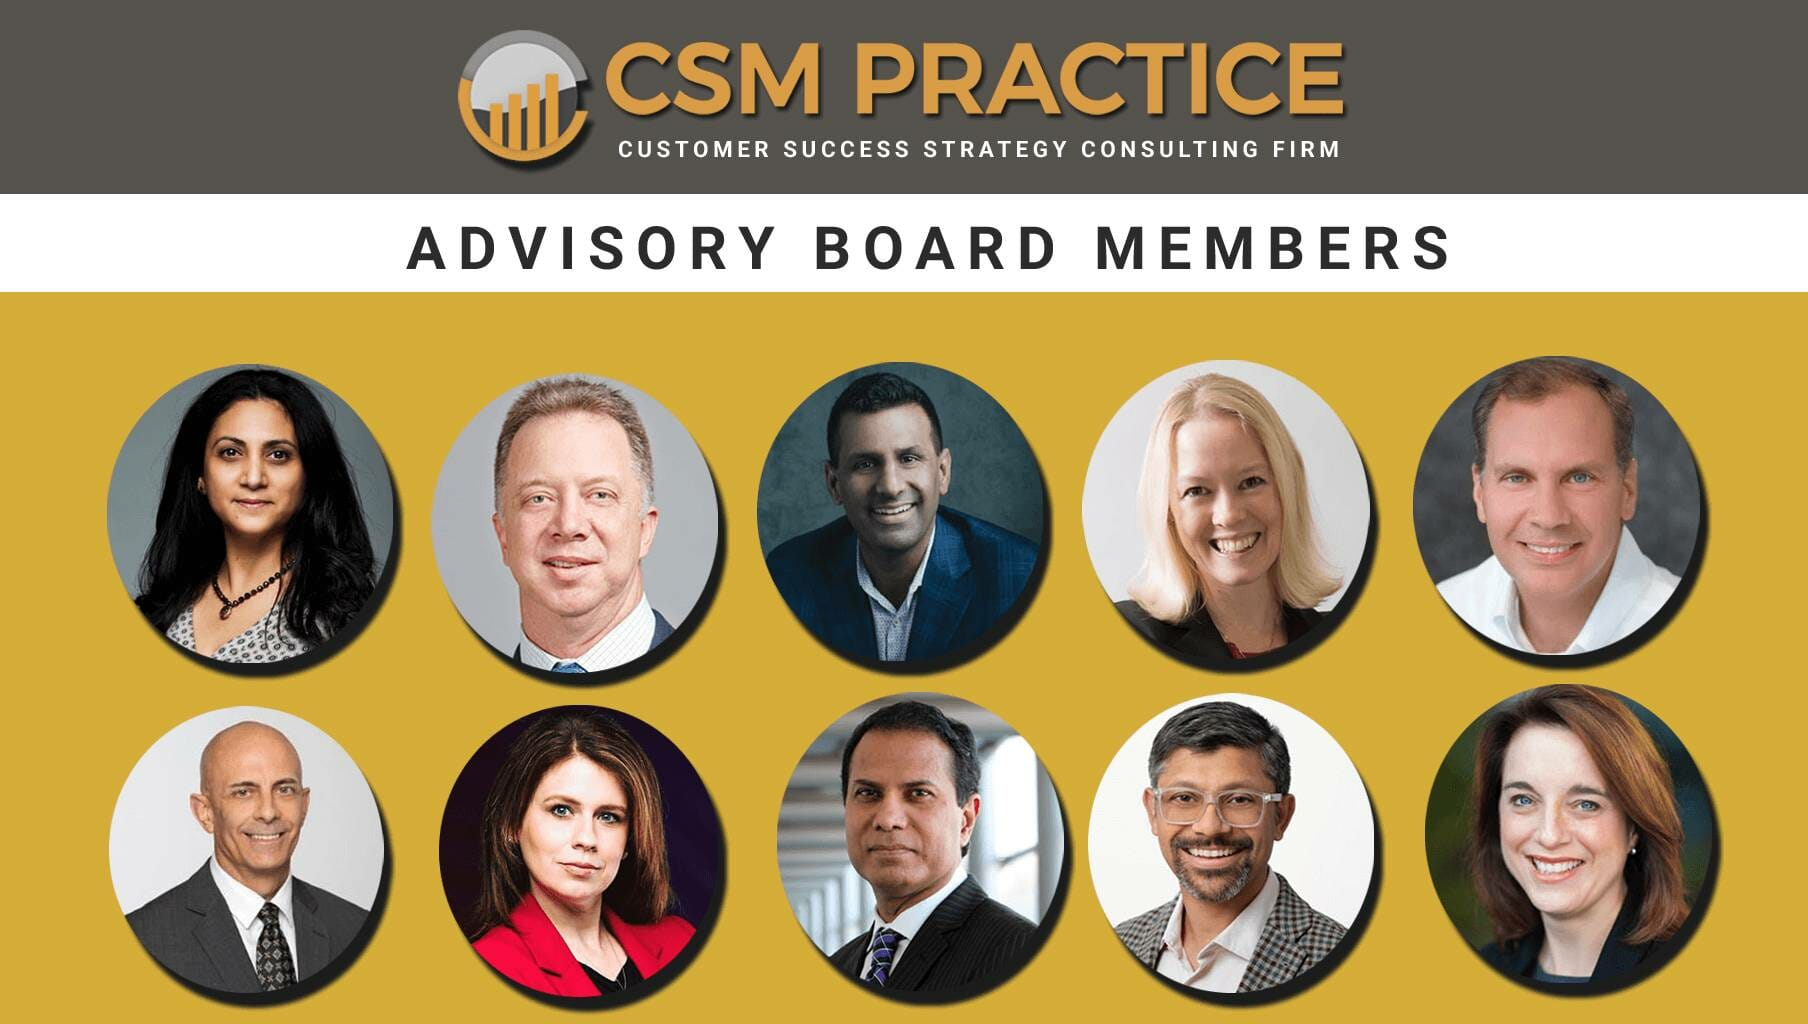 CSM Practice Advisory Board Members 1